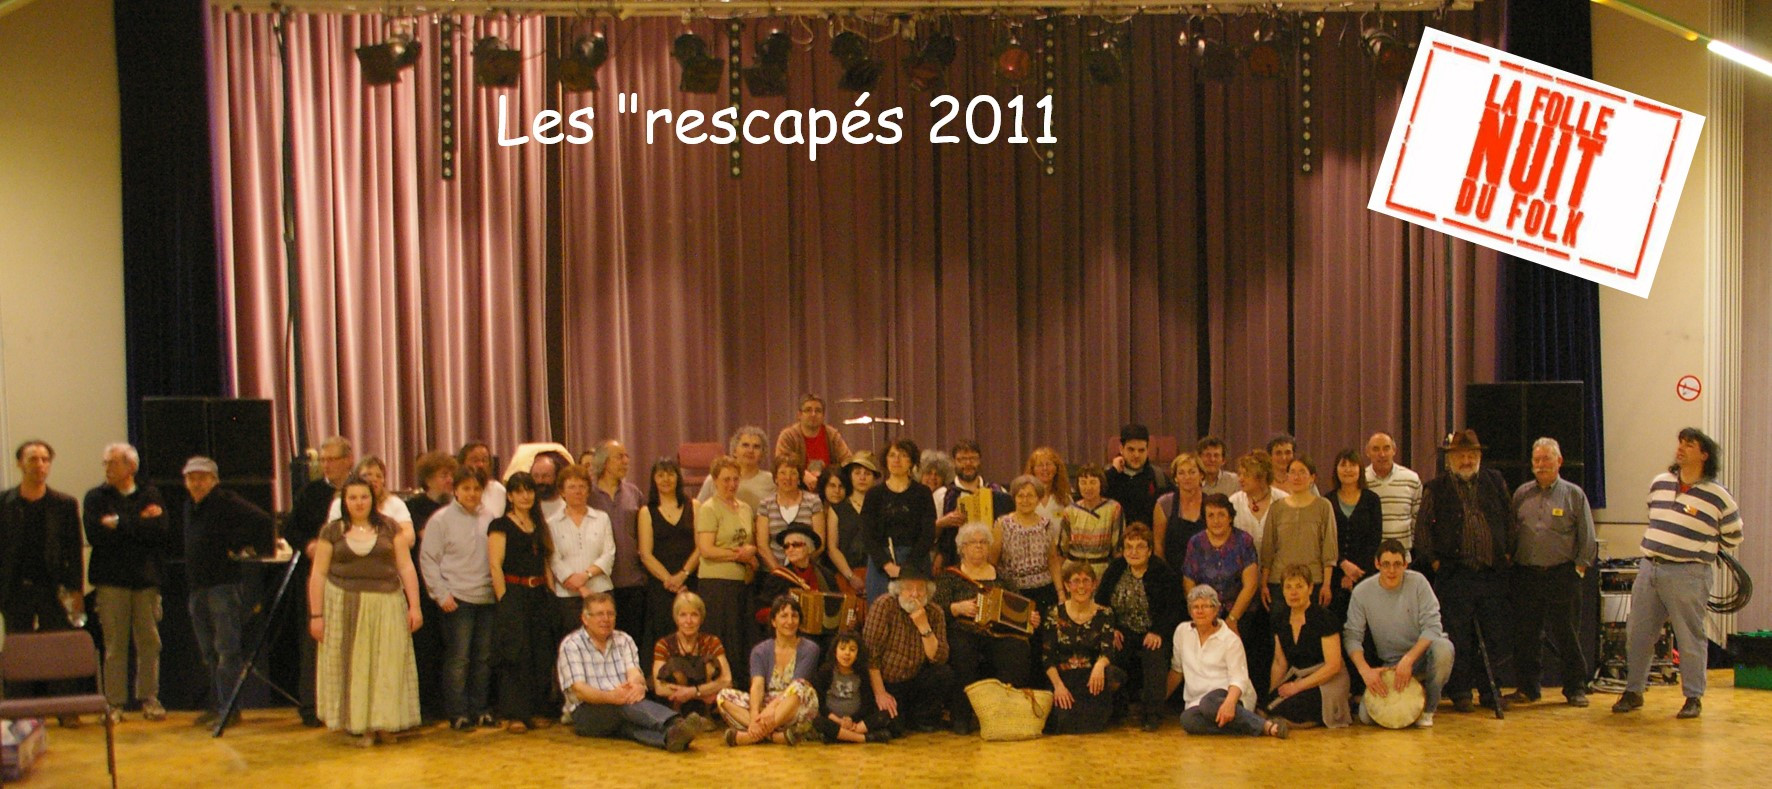 Rescapés Folle Nuit du Folk 2011